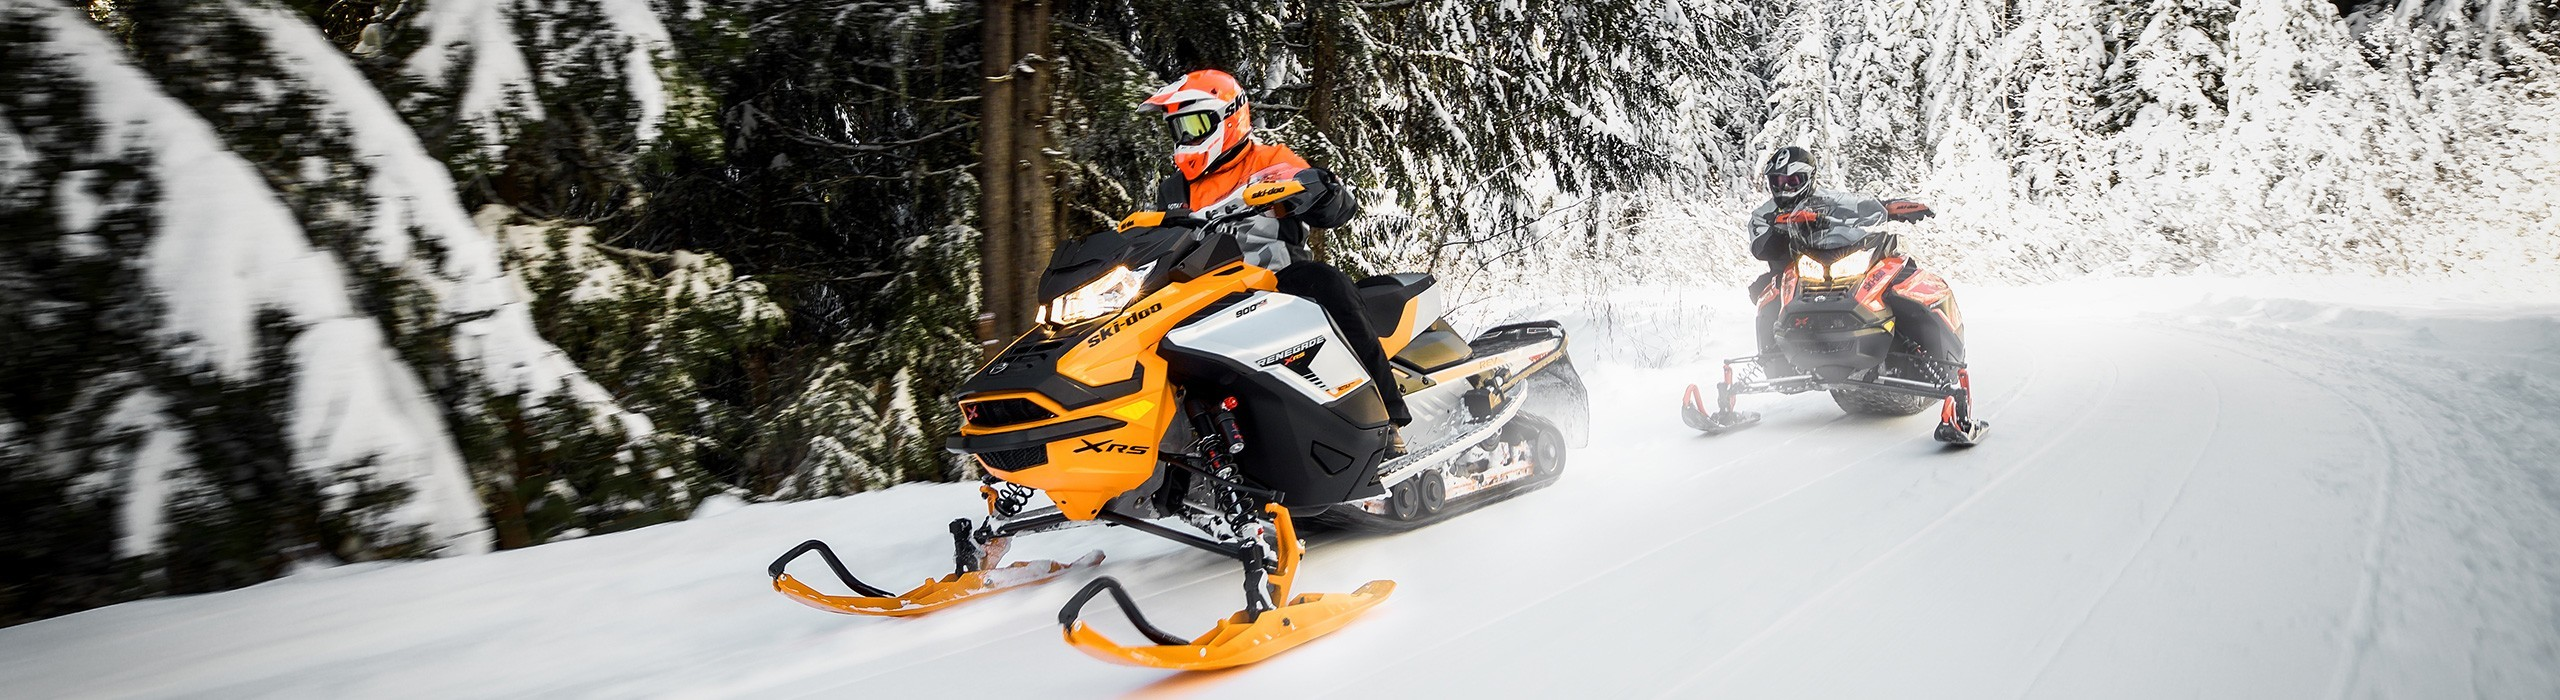 Motoneiges Ski-Doo de BRP, n°1 au Monde - Sas Chossade Busato Motoneiges et Quads (73 et 74)